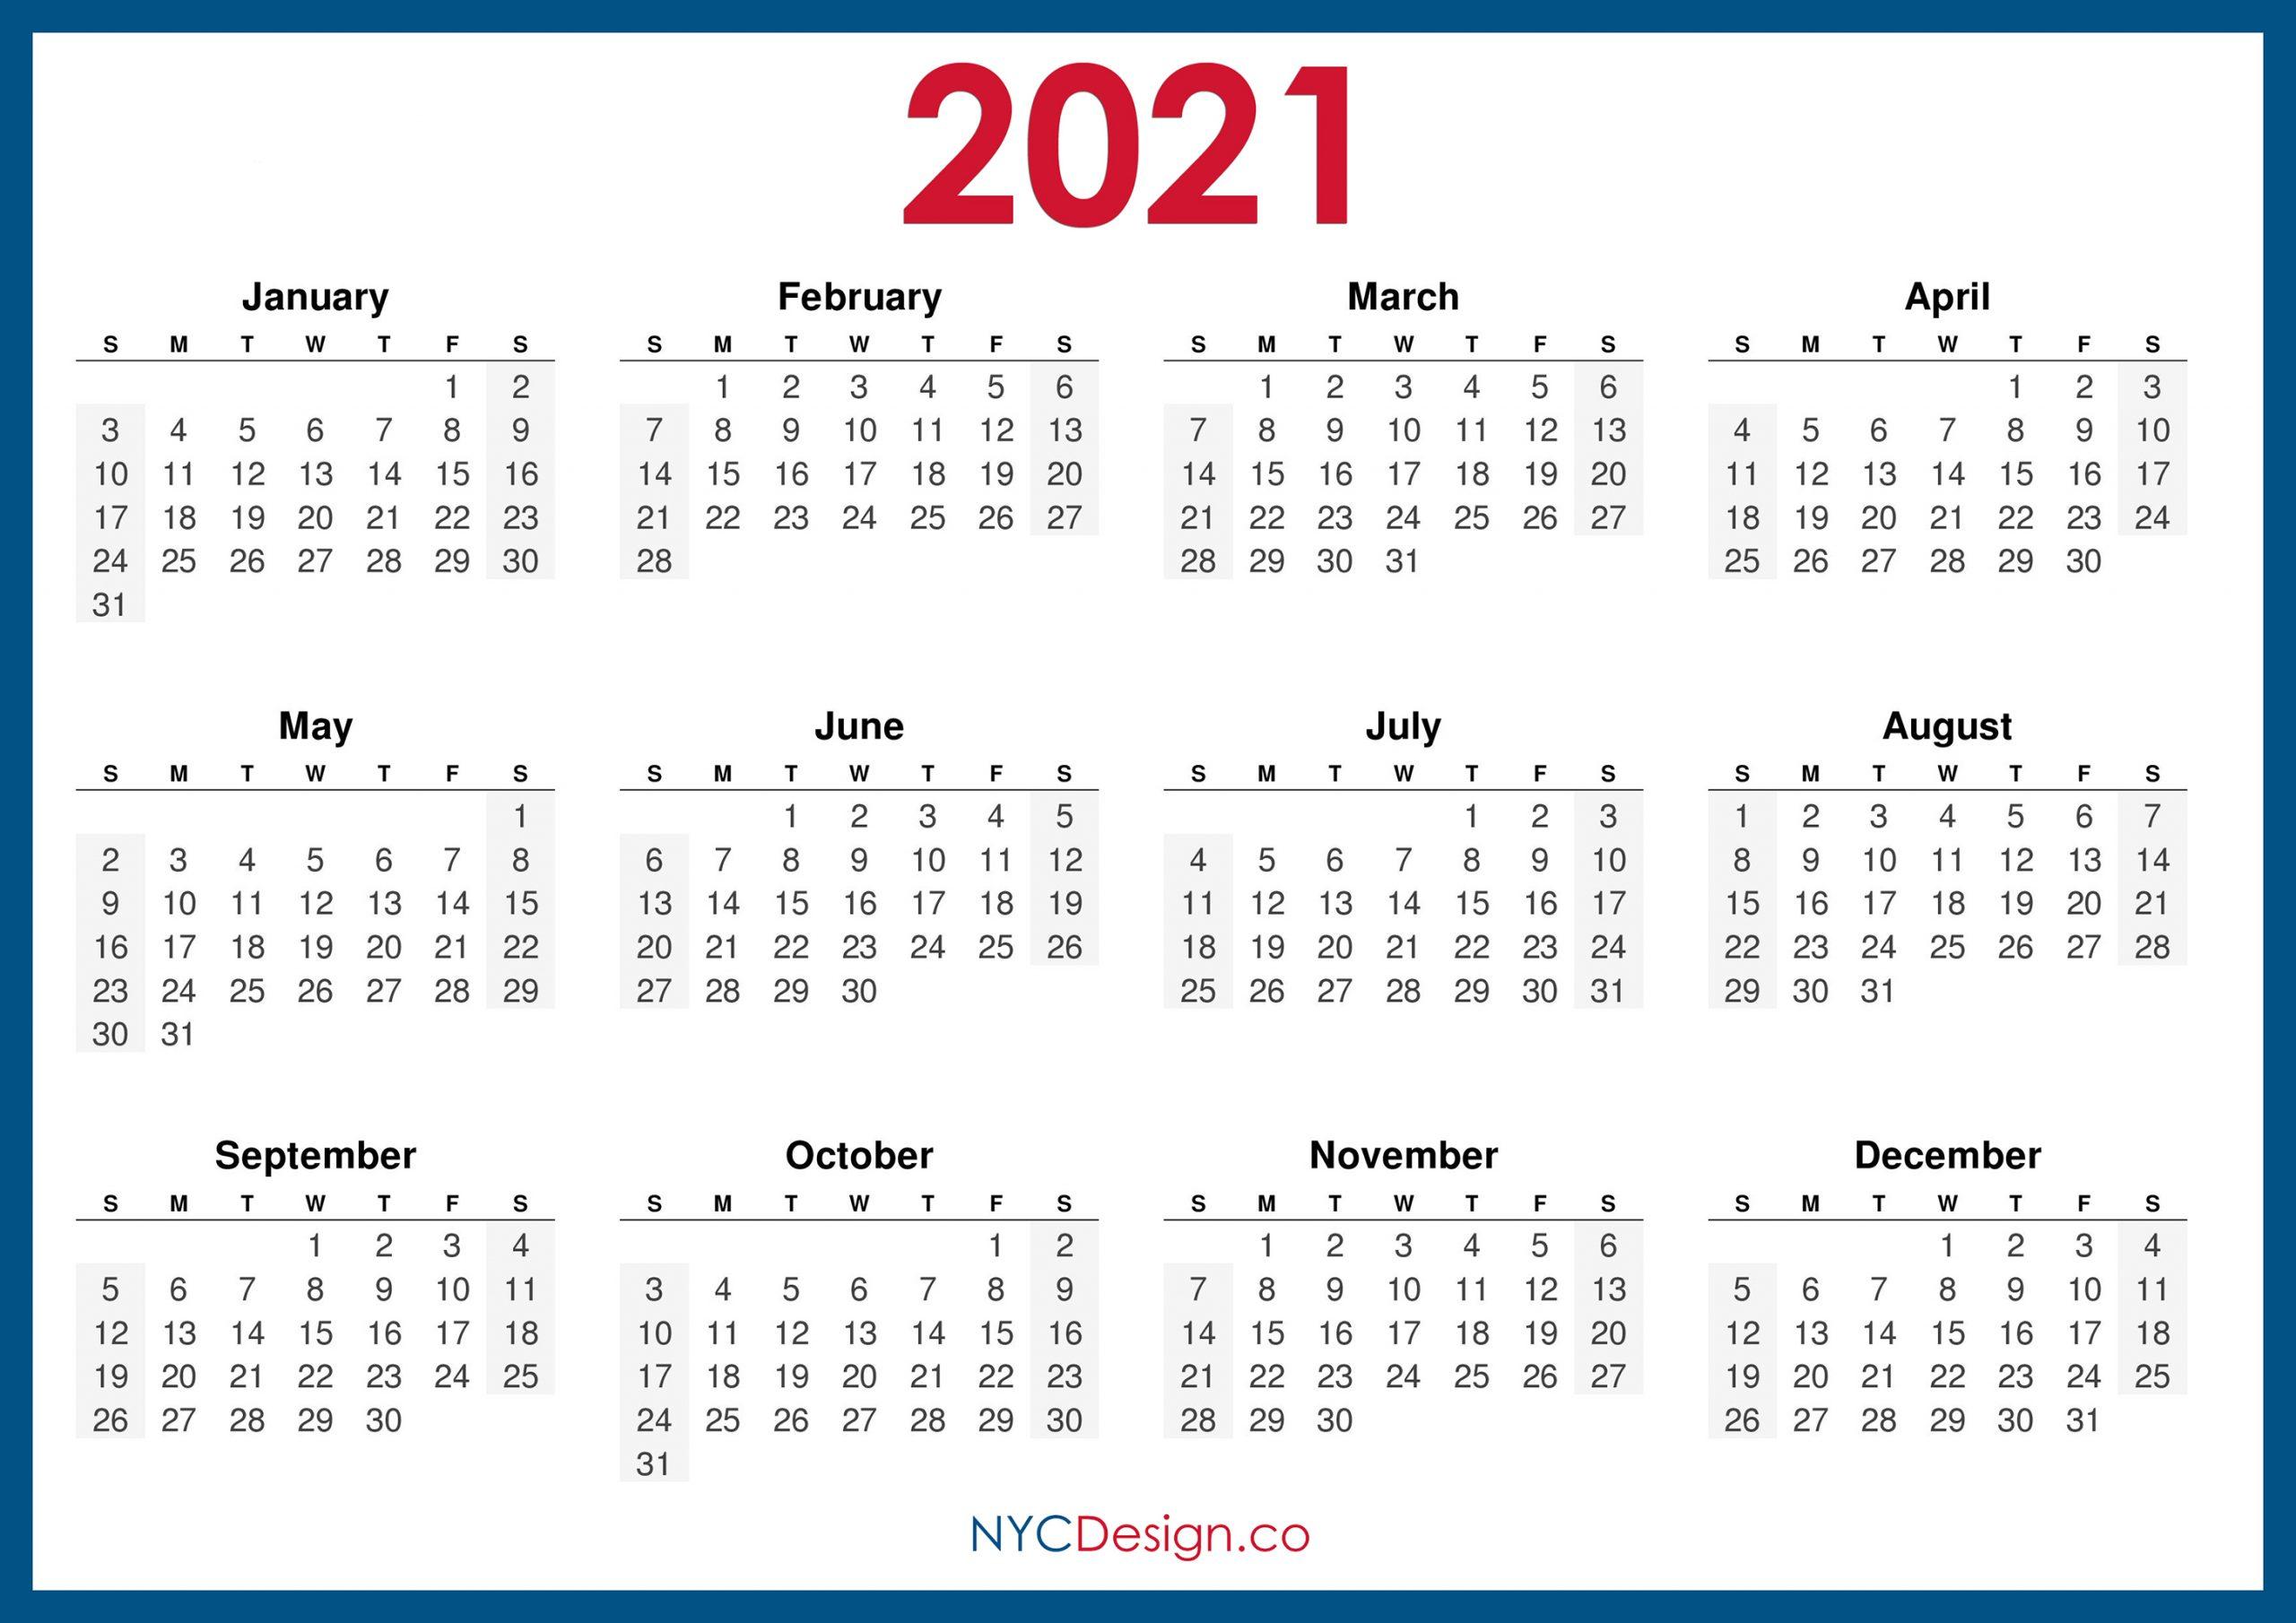 2021 Calendar Printable Free, Horizontal, Blue, Hd